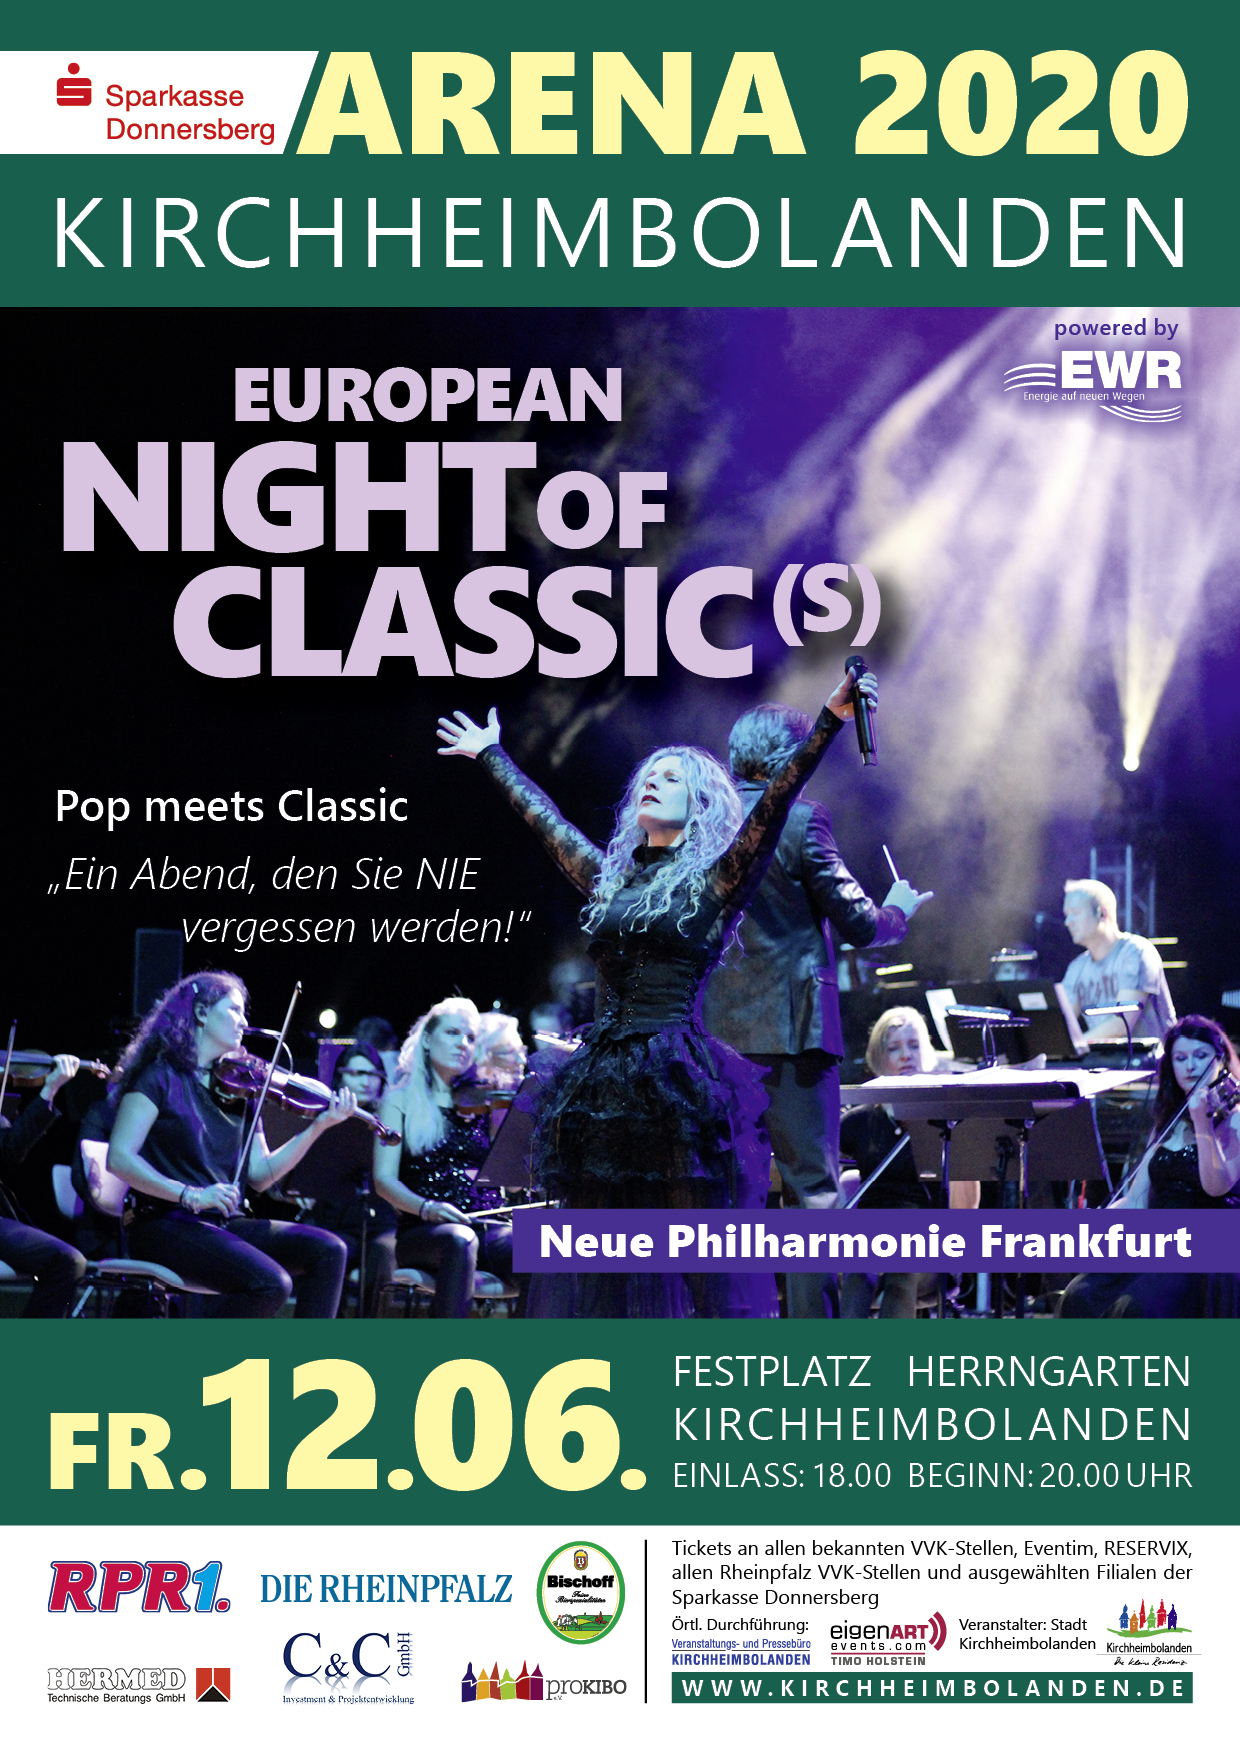 ARENA 2020 EUROPEAN NIGHT OF CLASSIC(S) präsentiert von proKIBO e.V.